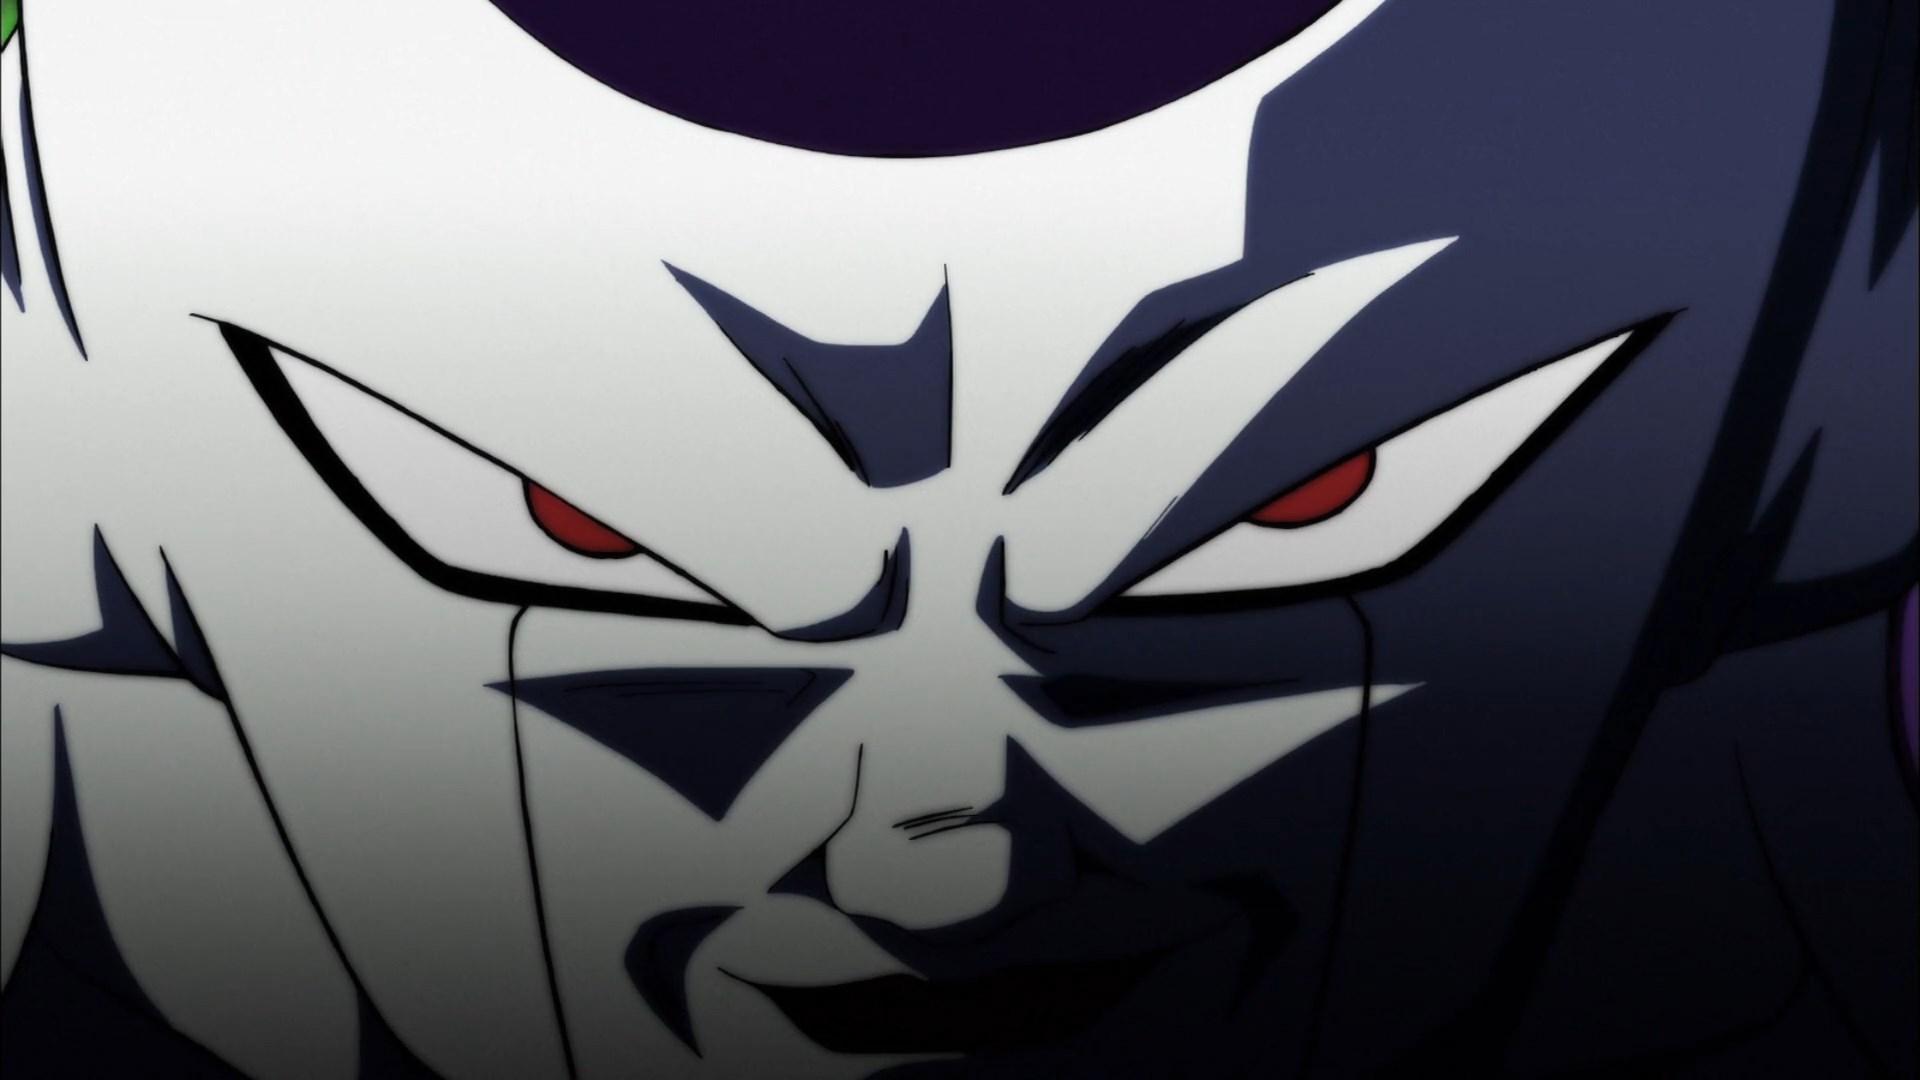 [HorribleSubs] Dragon Ball Super - 121 [1080p].mkv_snapshot_11.53